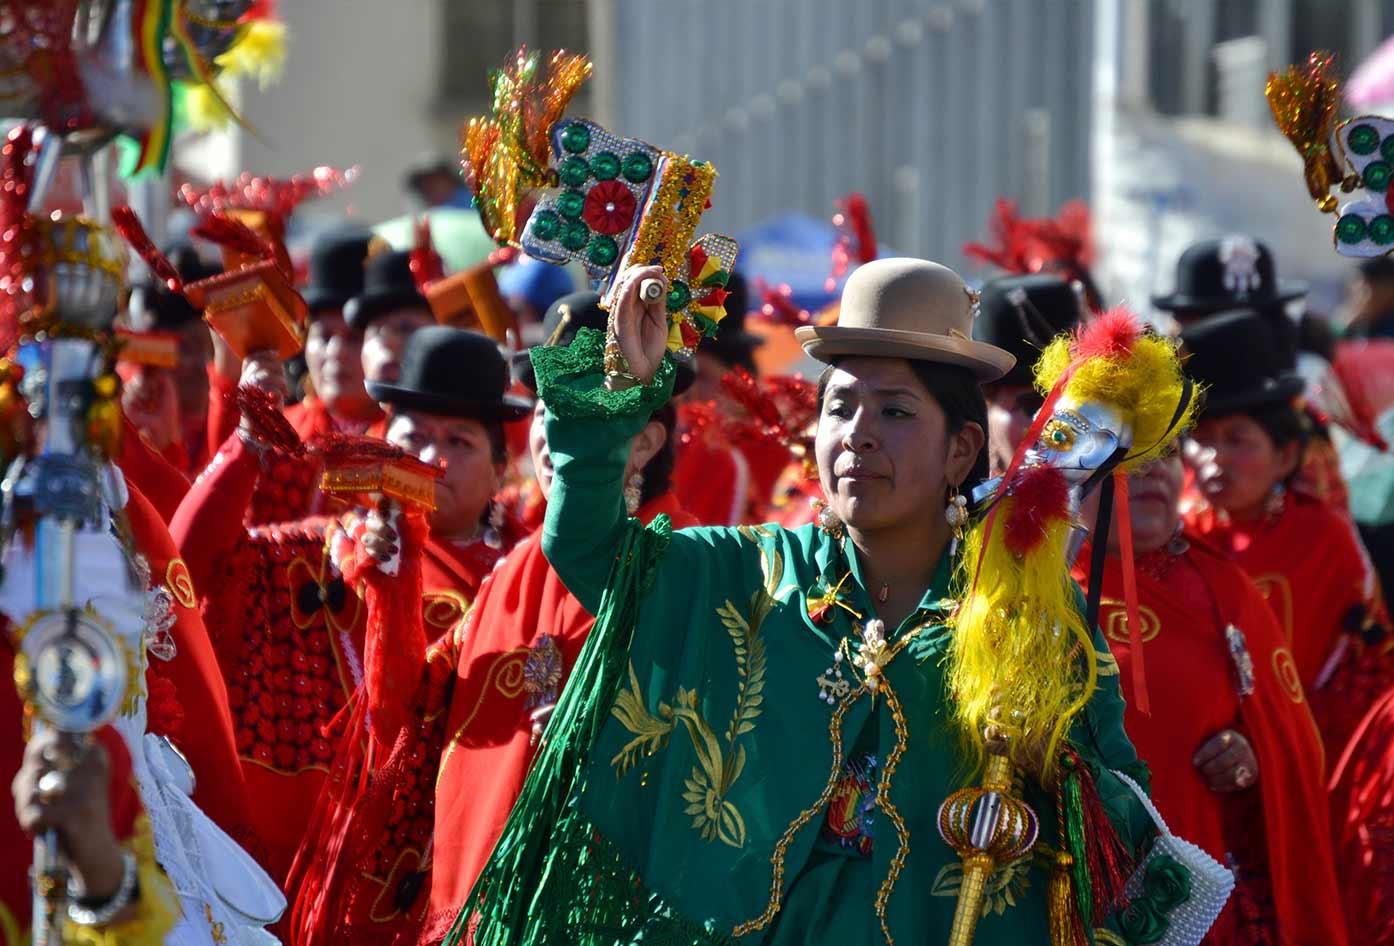 bolivian dance culture